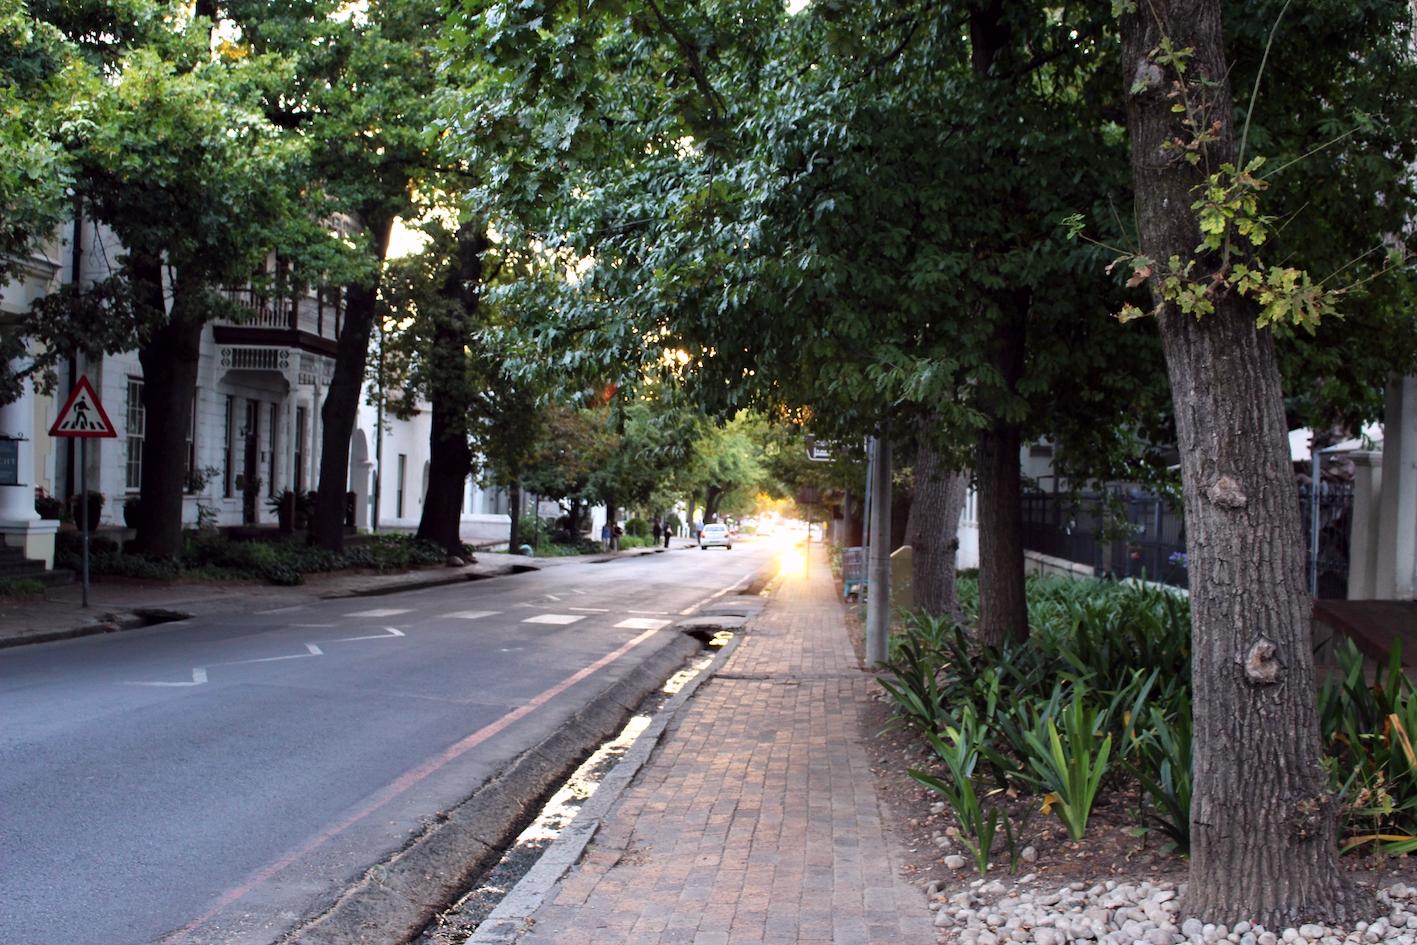 A photo I took on a walk in Stellenbosch, South Africa.